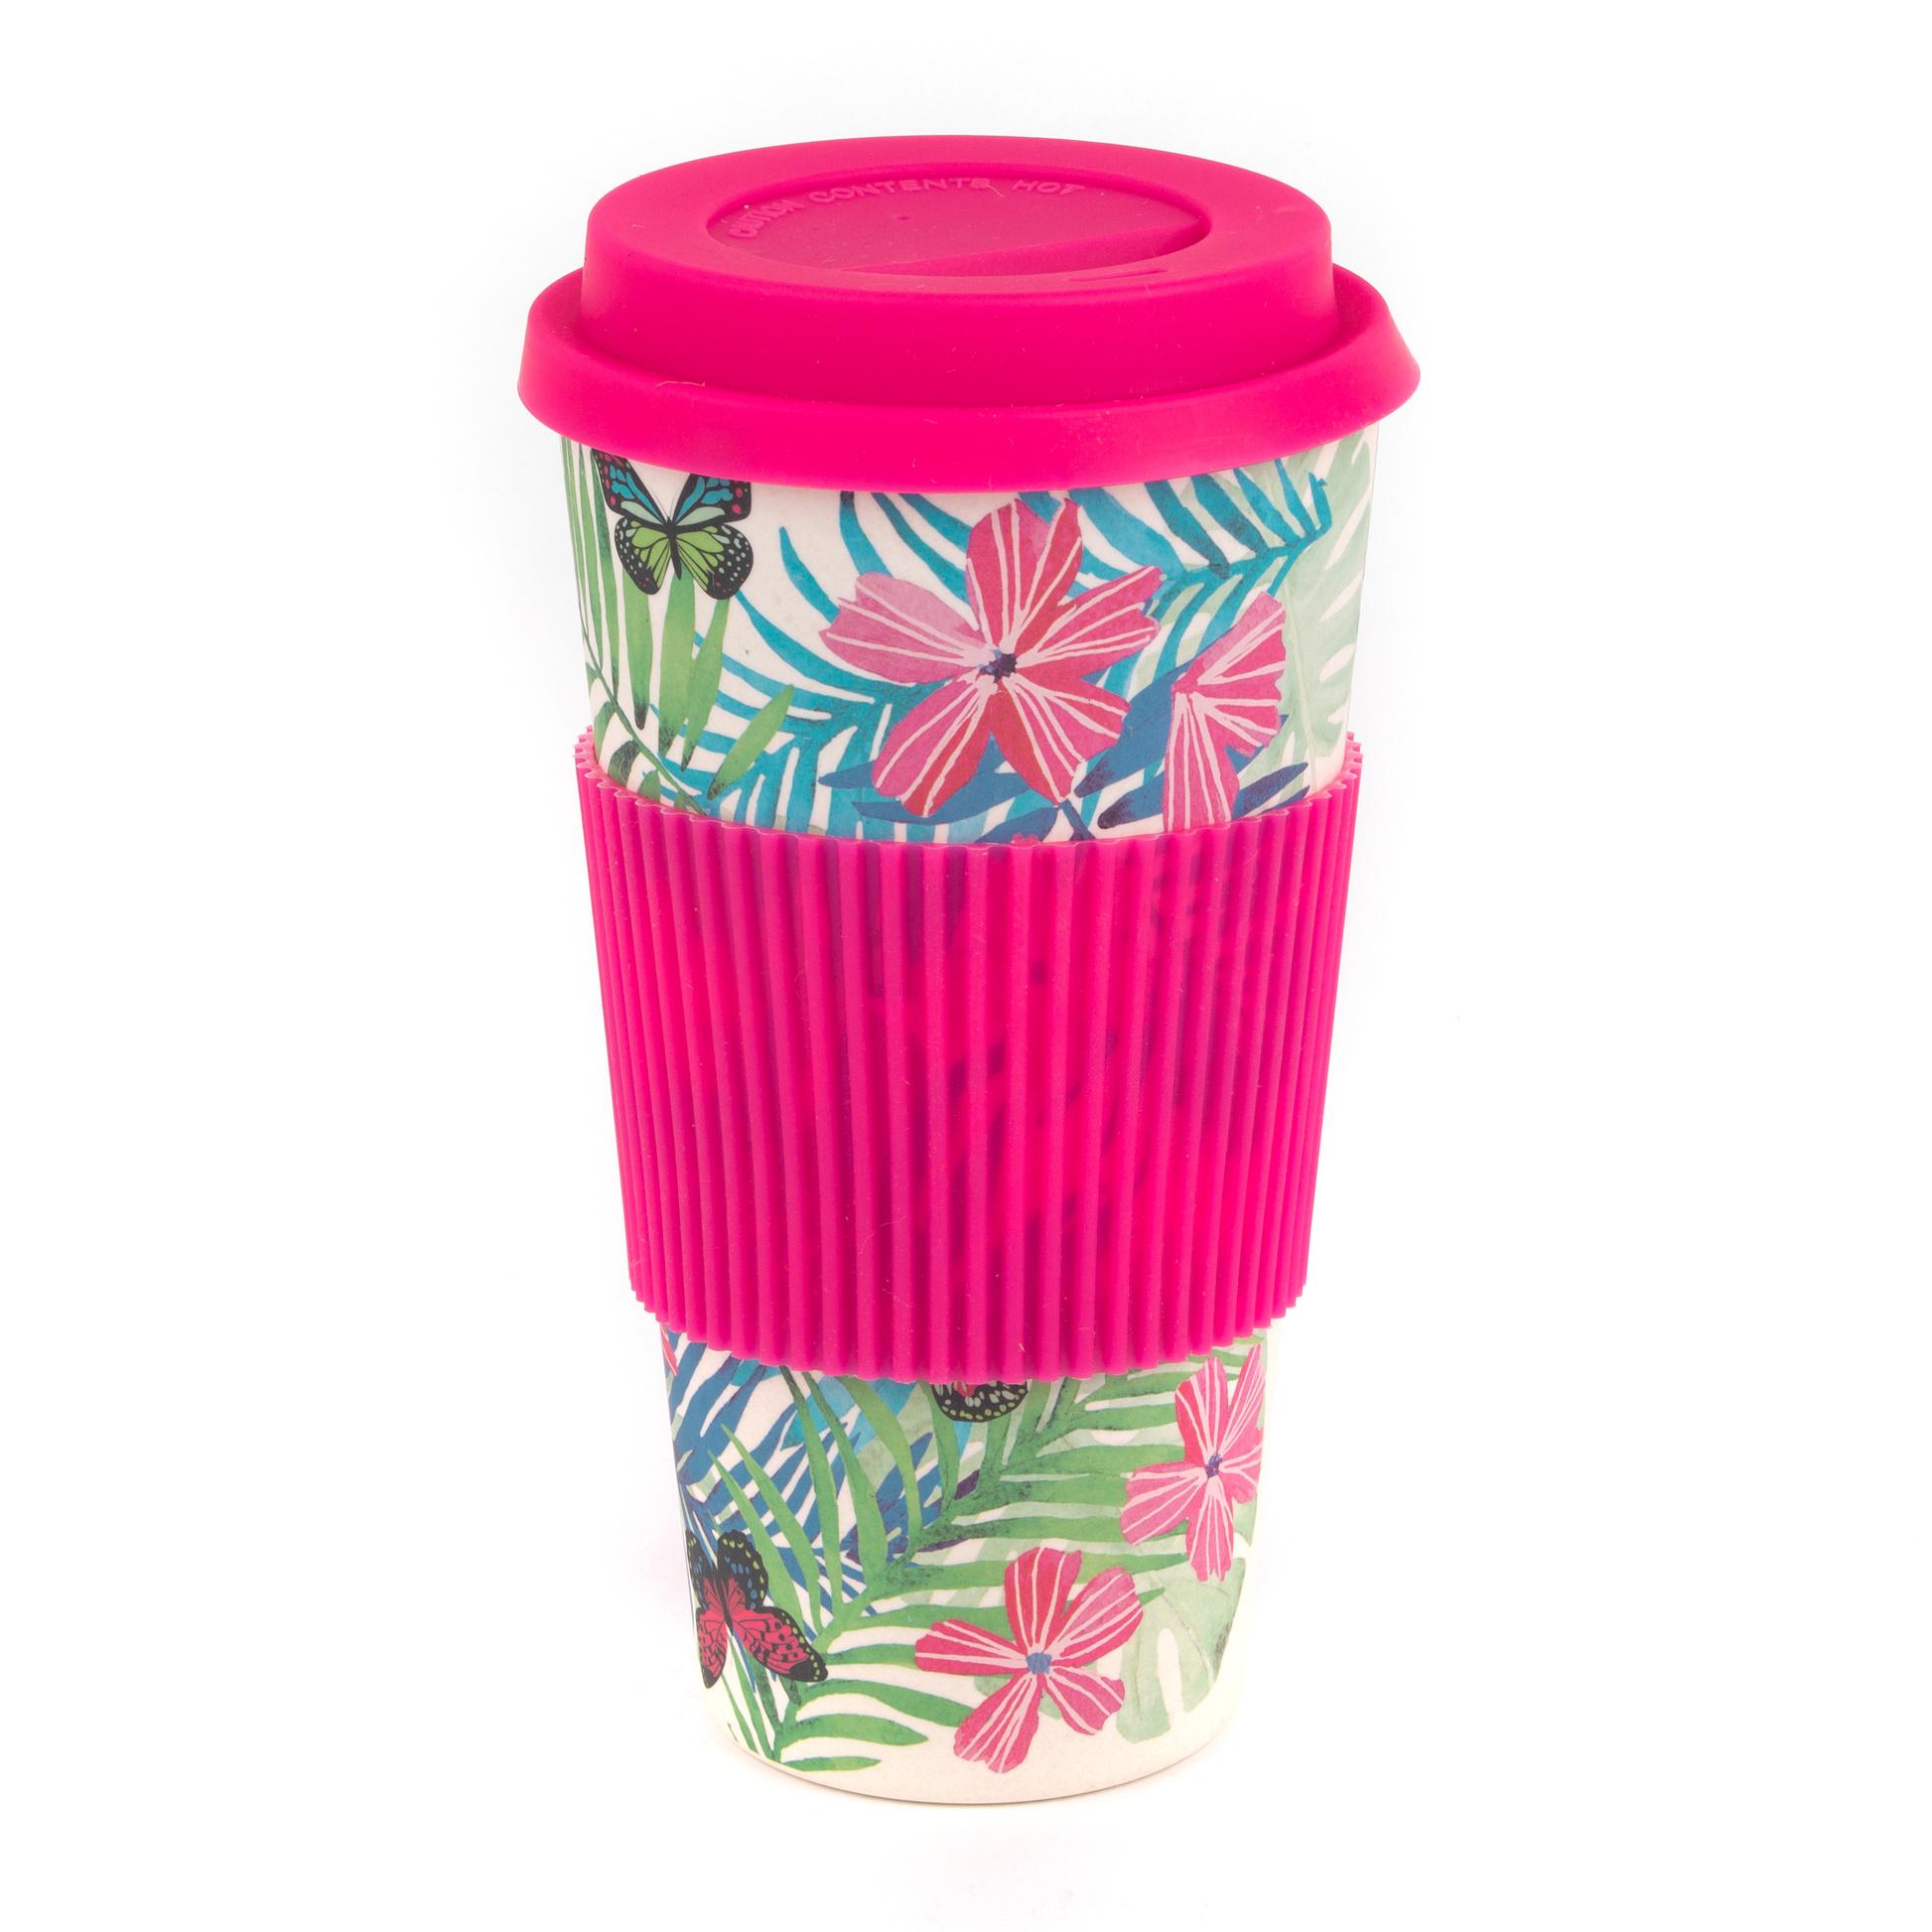 Cambridge CM05972 Tropical Forest Reusable Coffee Cup Travel Mug